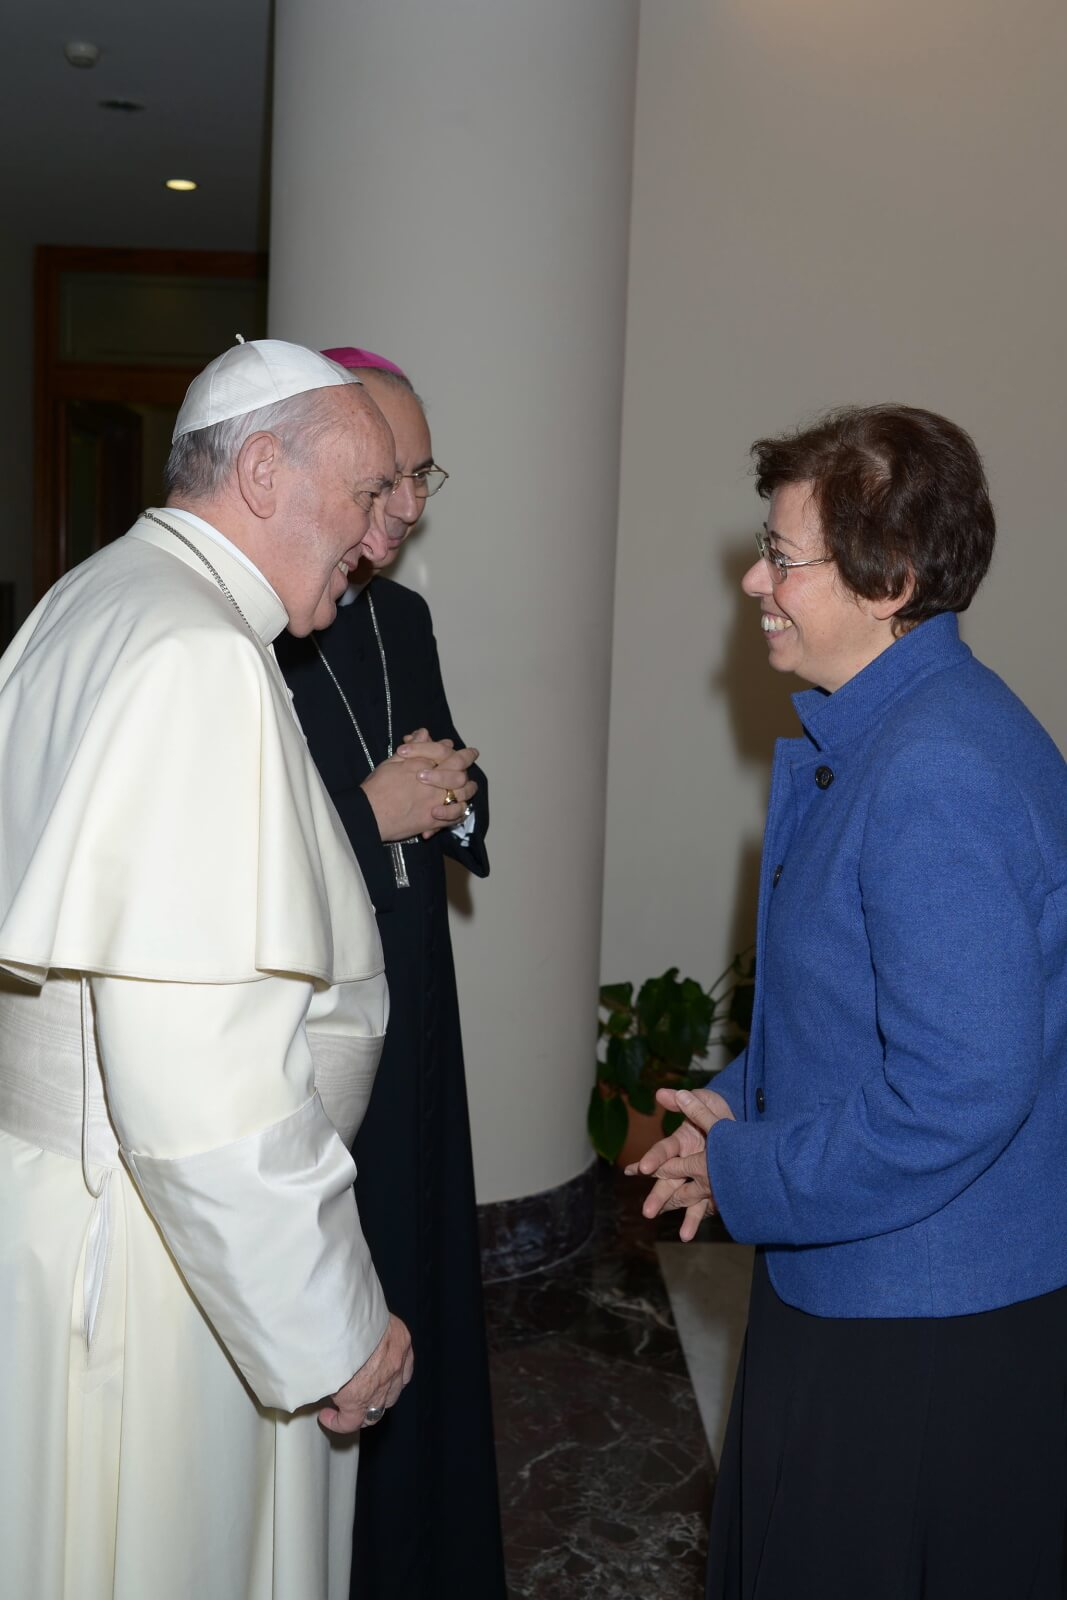 Papież mianował Francescę Di Giovanni na podsekretarz Stanu fot. EPA/VATICAN MEDIA